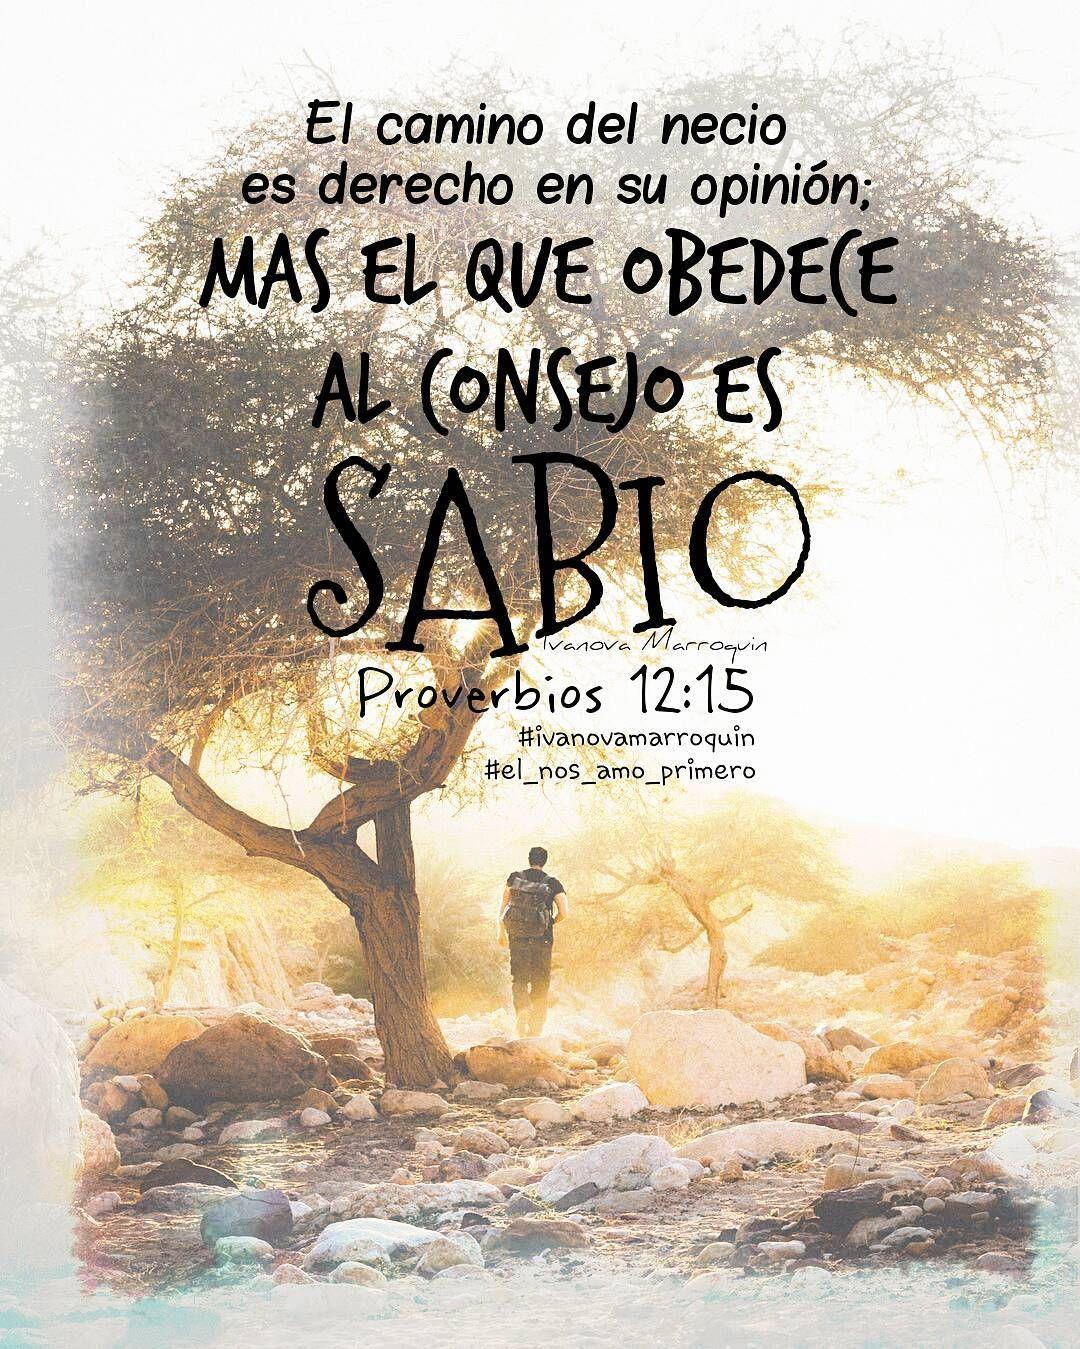 Proverbios y Refranes - Página 4 B0f6745fa31985e23eec149a2084a8a7